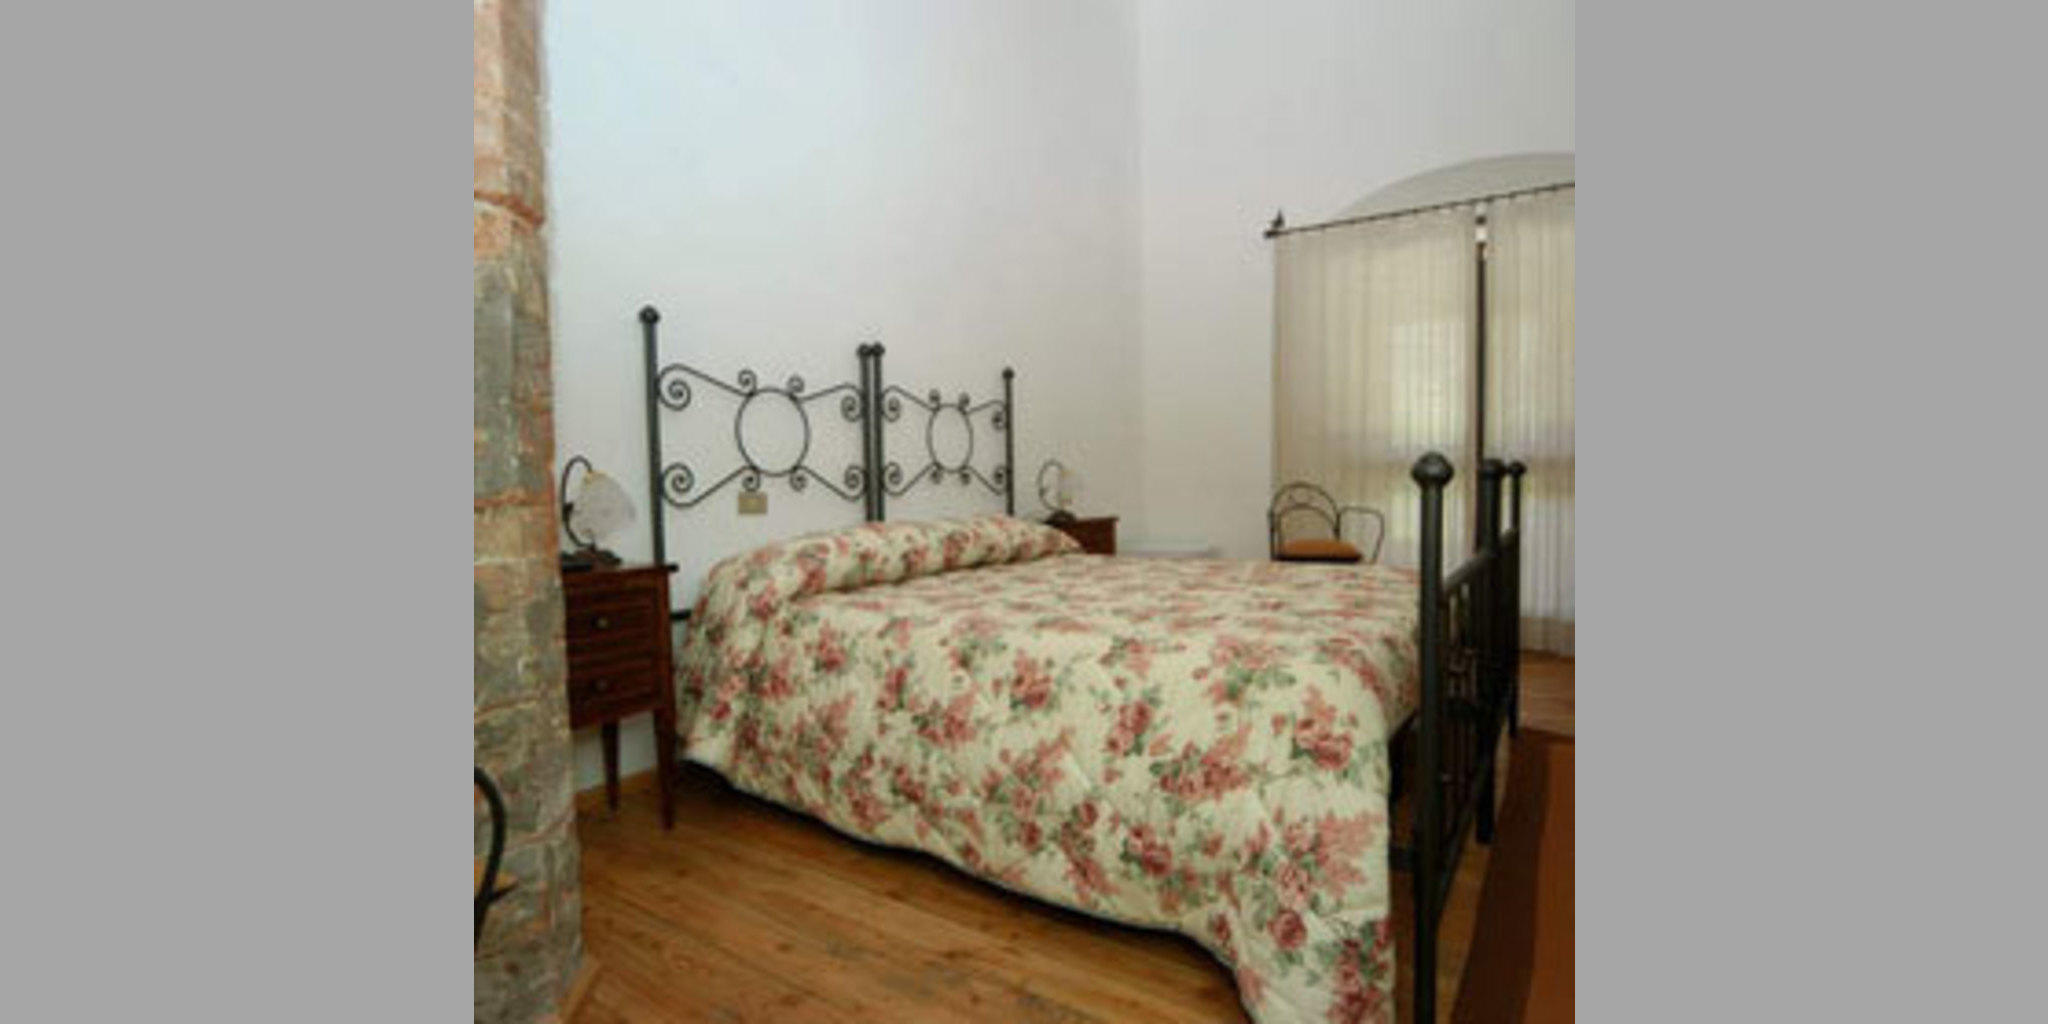 Bed & Breakfast Bevagna - Madonna Della Valle